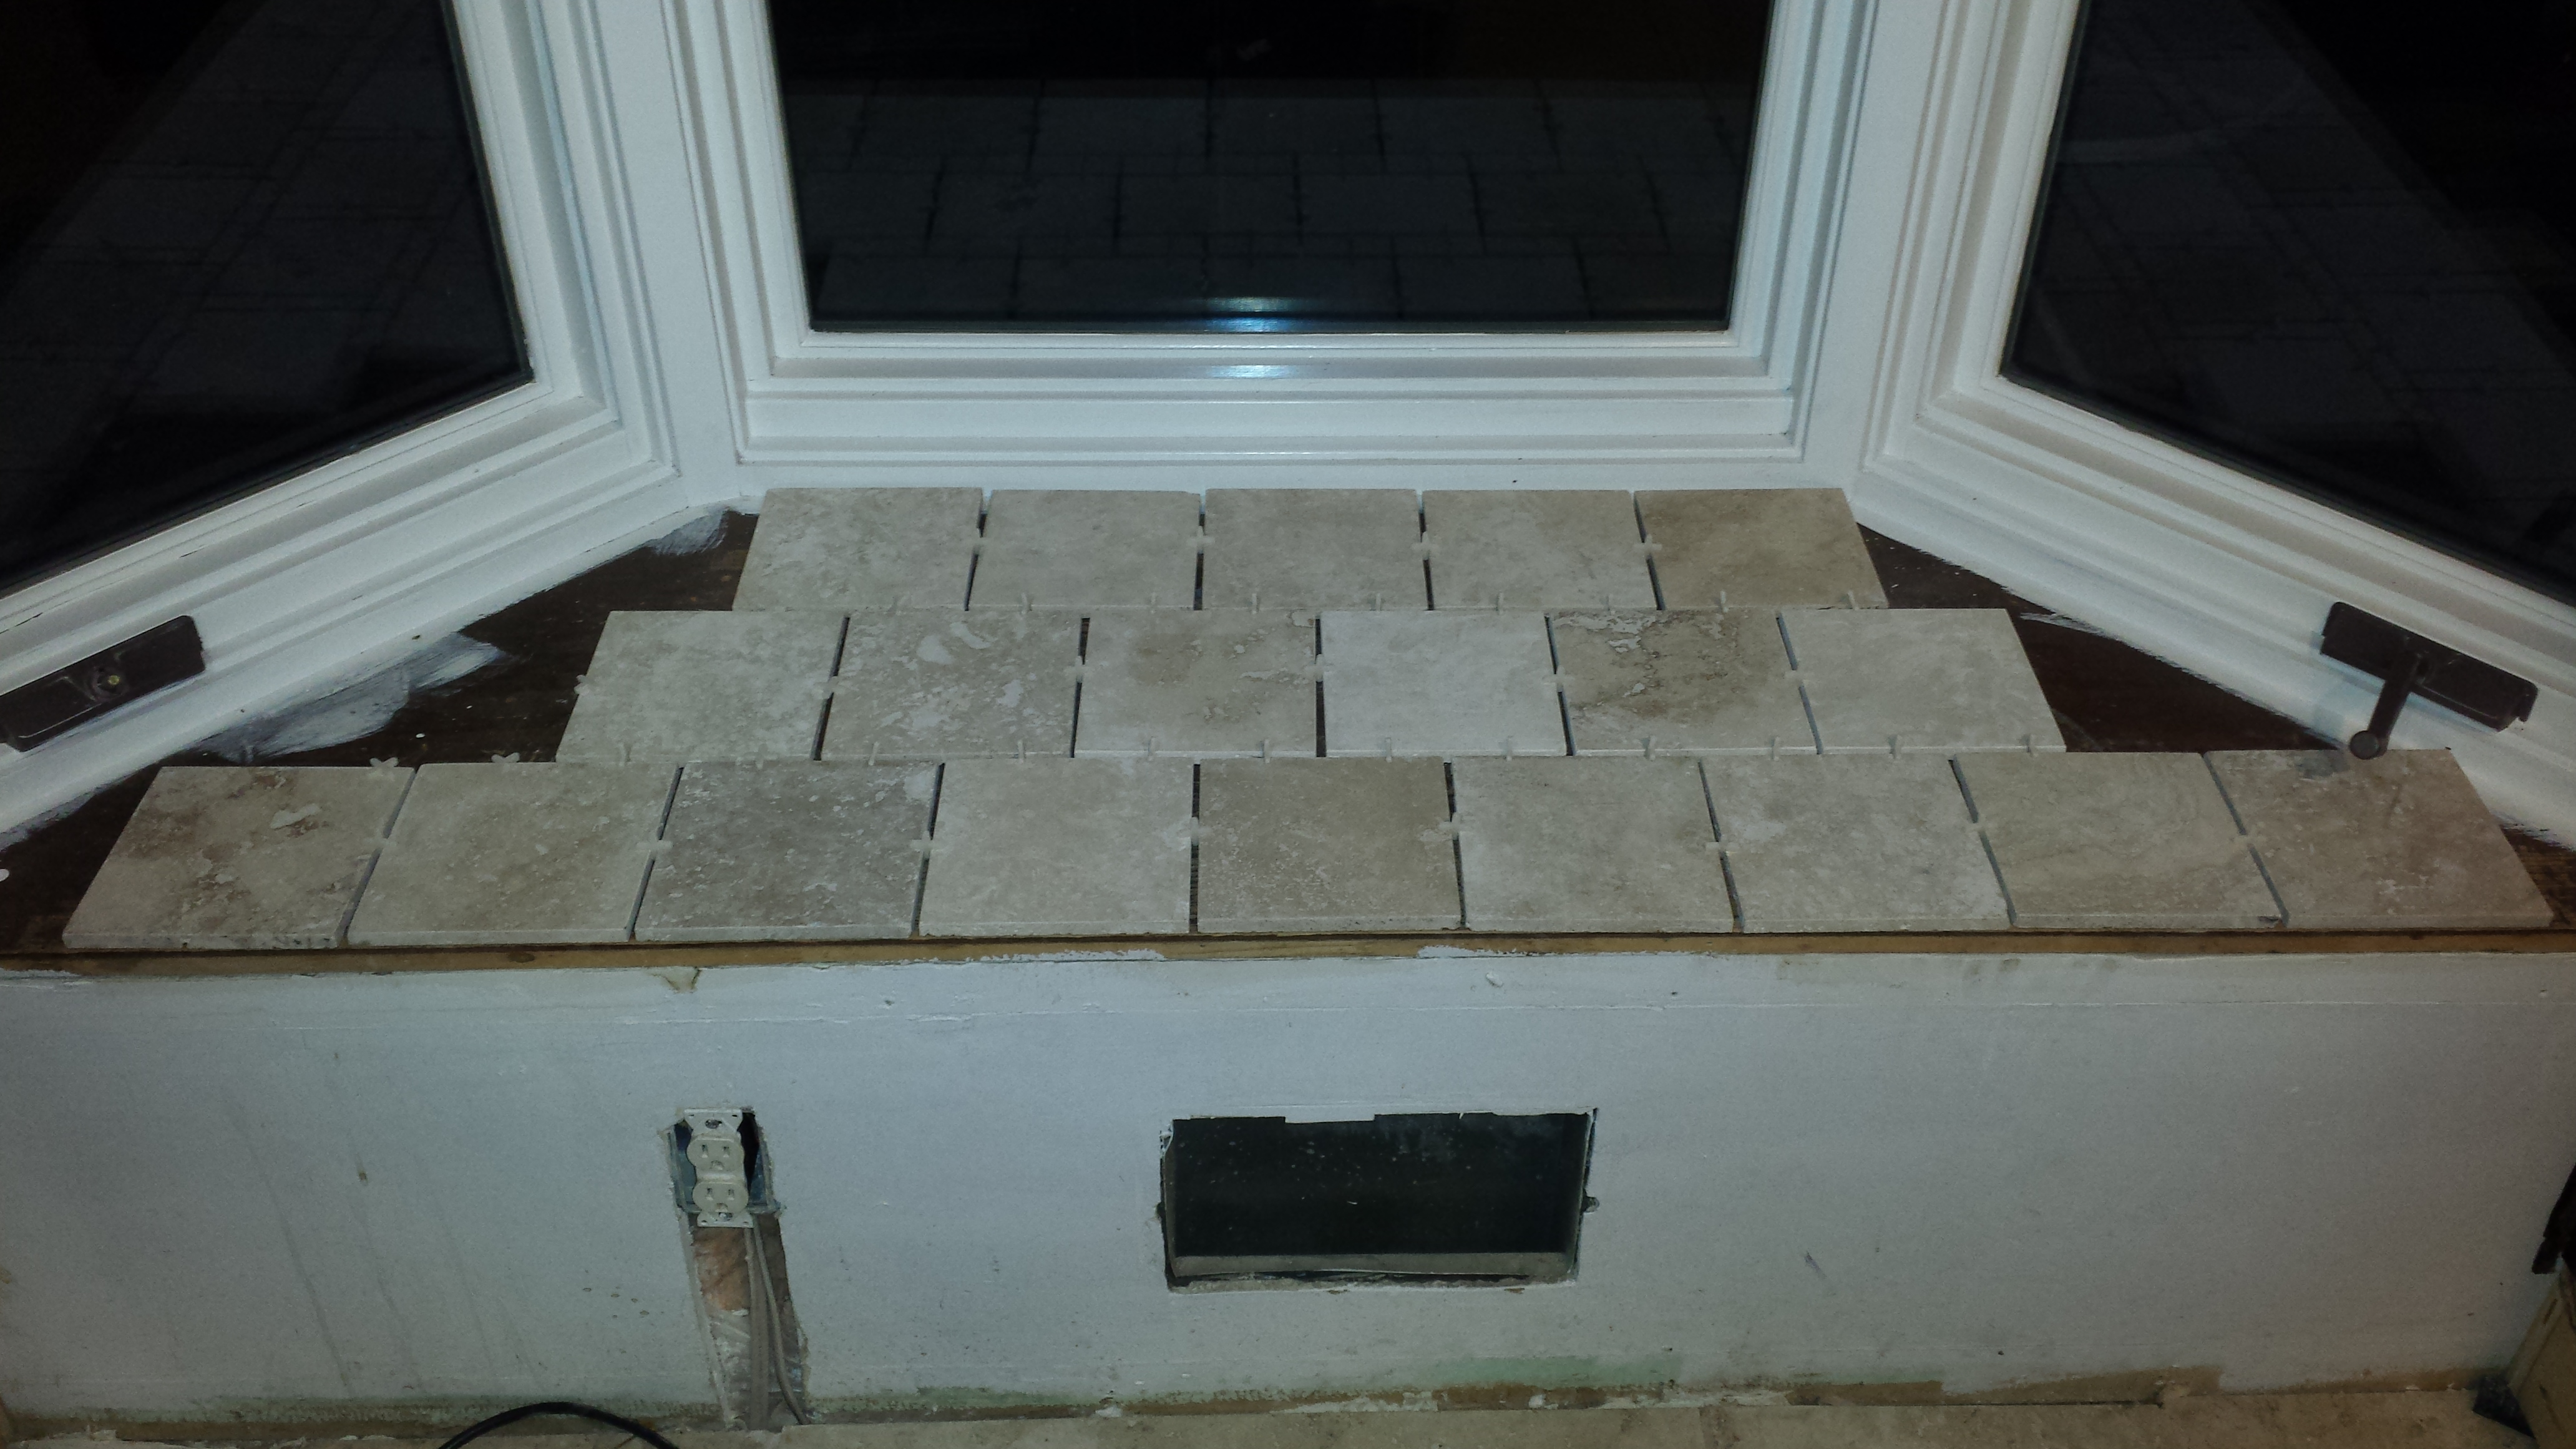 Pleasing Tiling Bay Window Seat Diy Step By Step Aubs Bloggin Machost Co Dining Chair Design Ideas Machostcouk